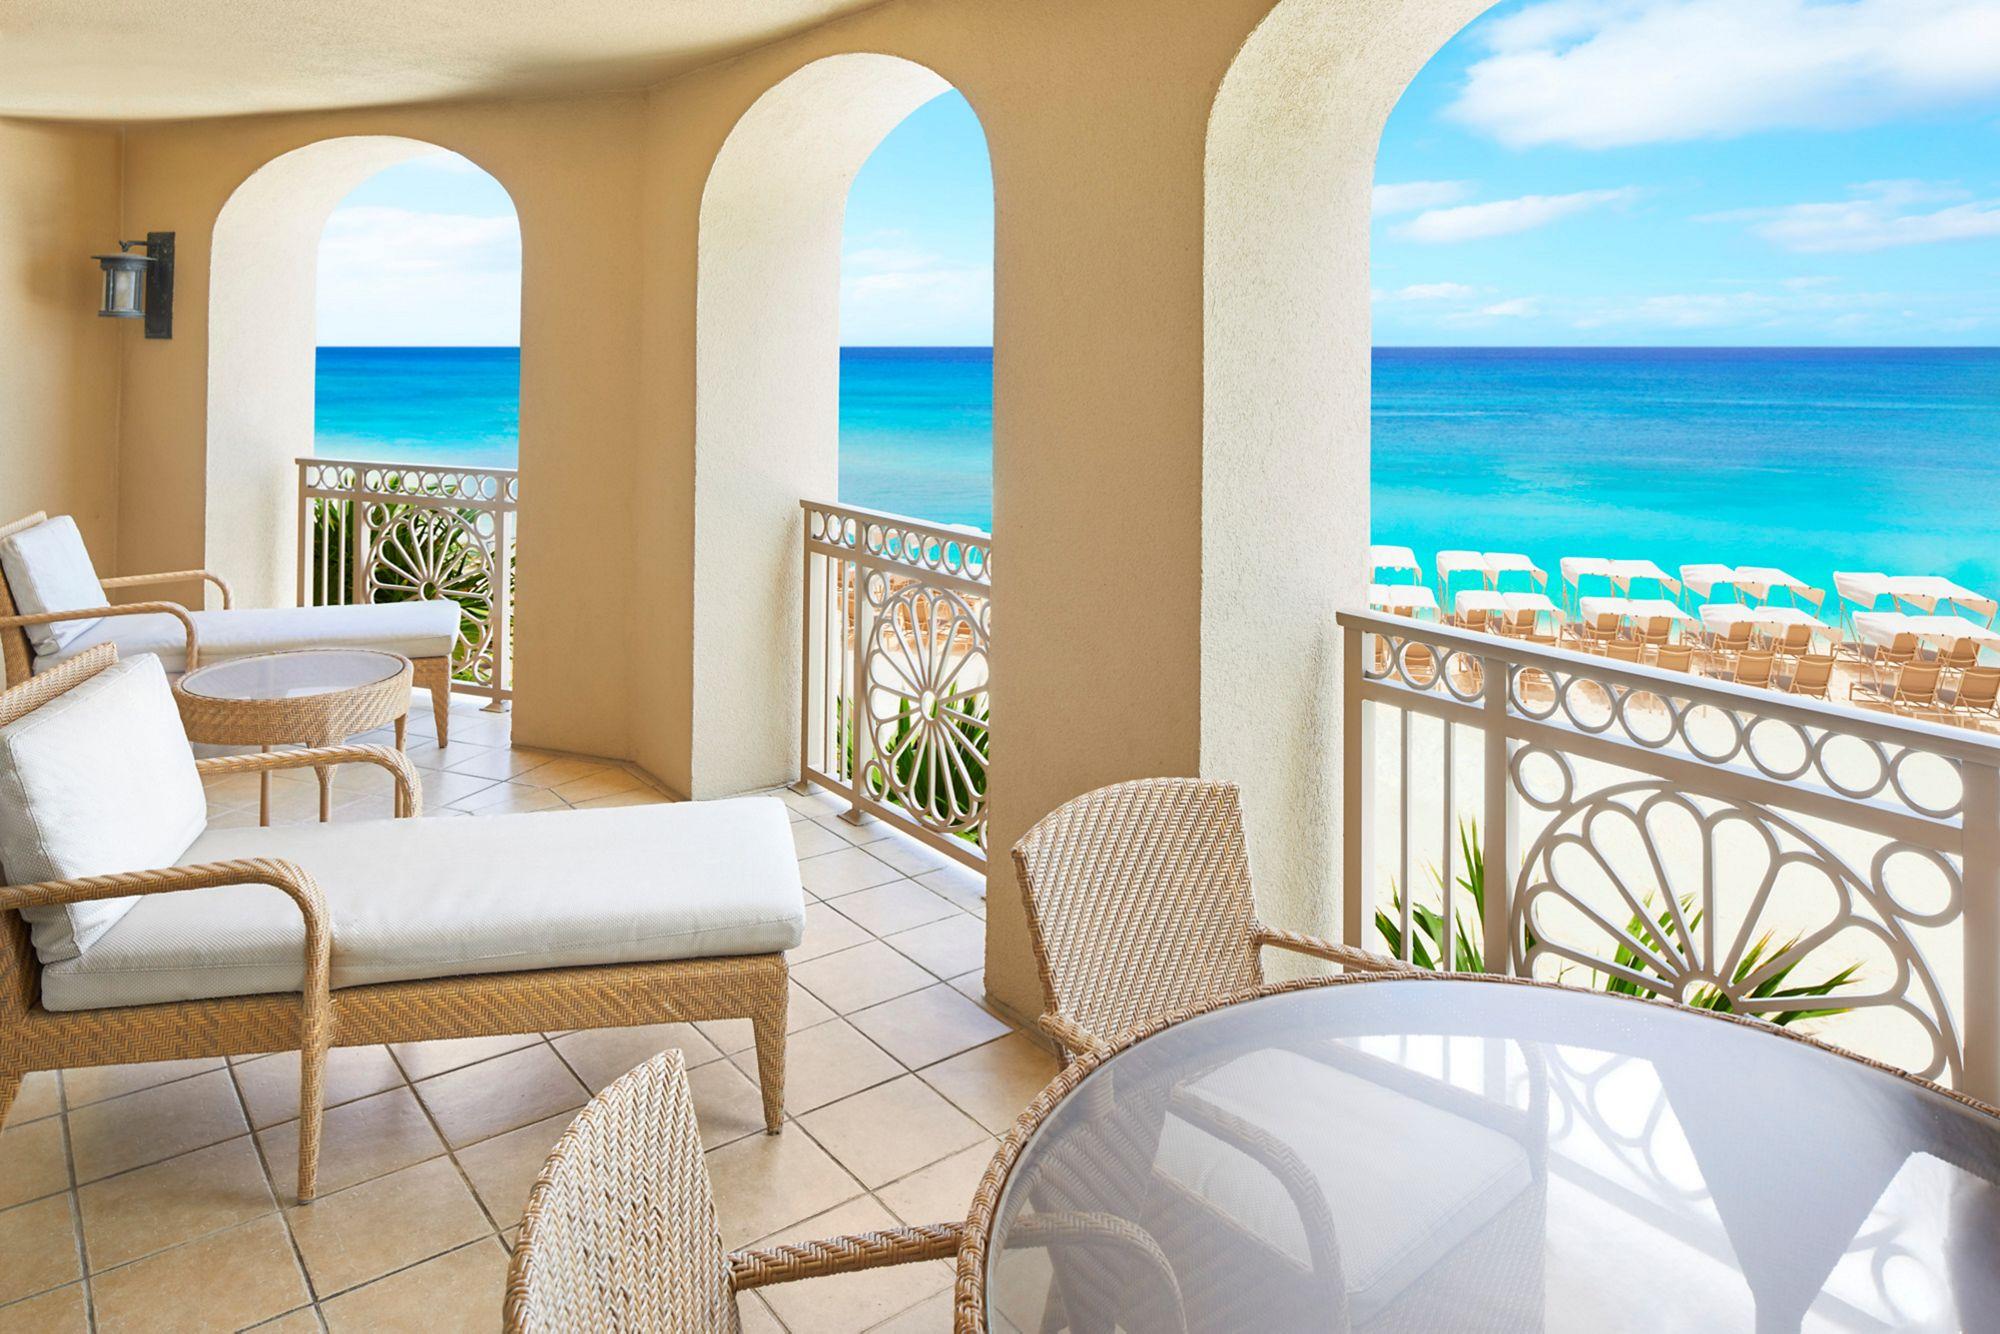 Residential Suite - Oceanfront Terrace